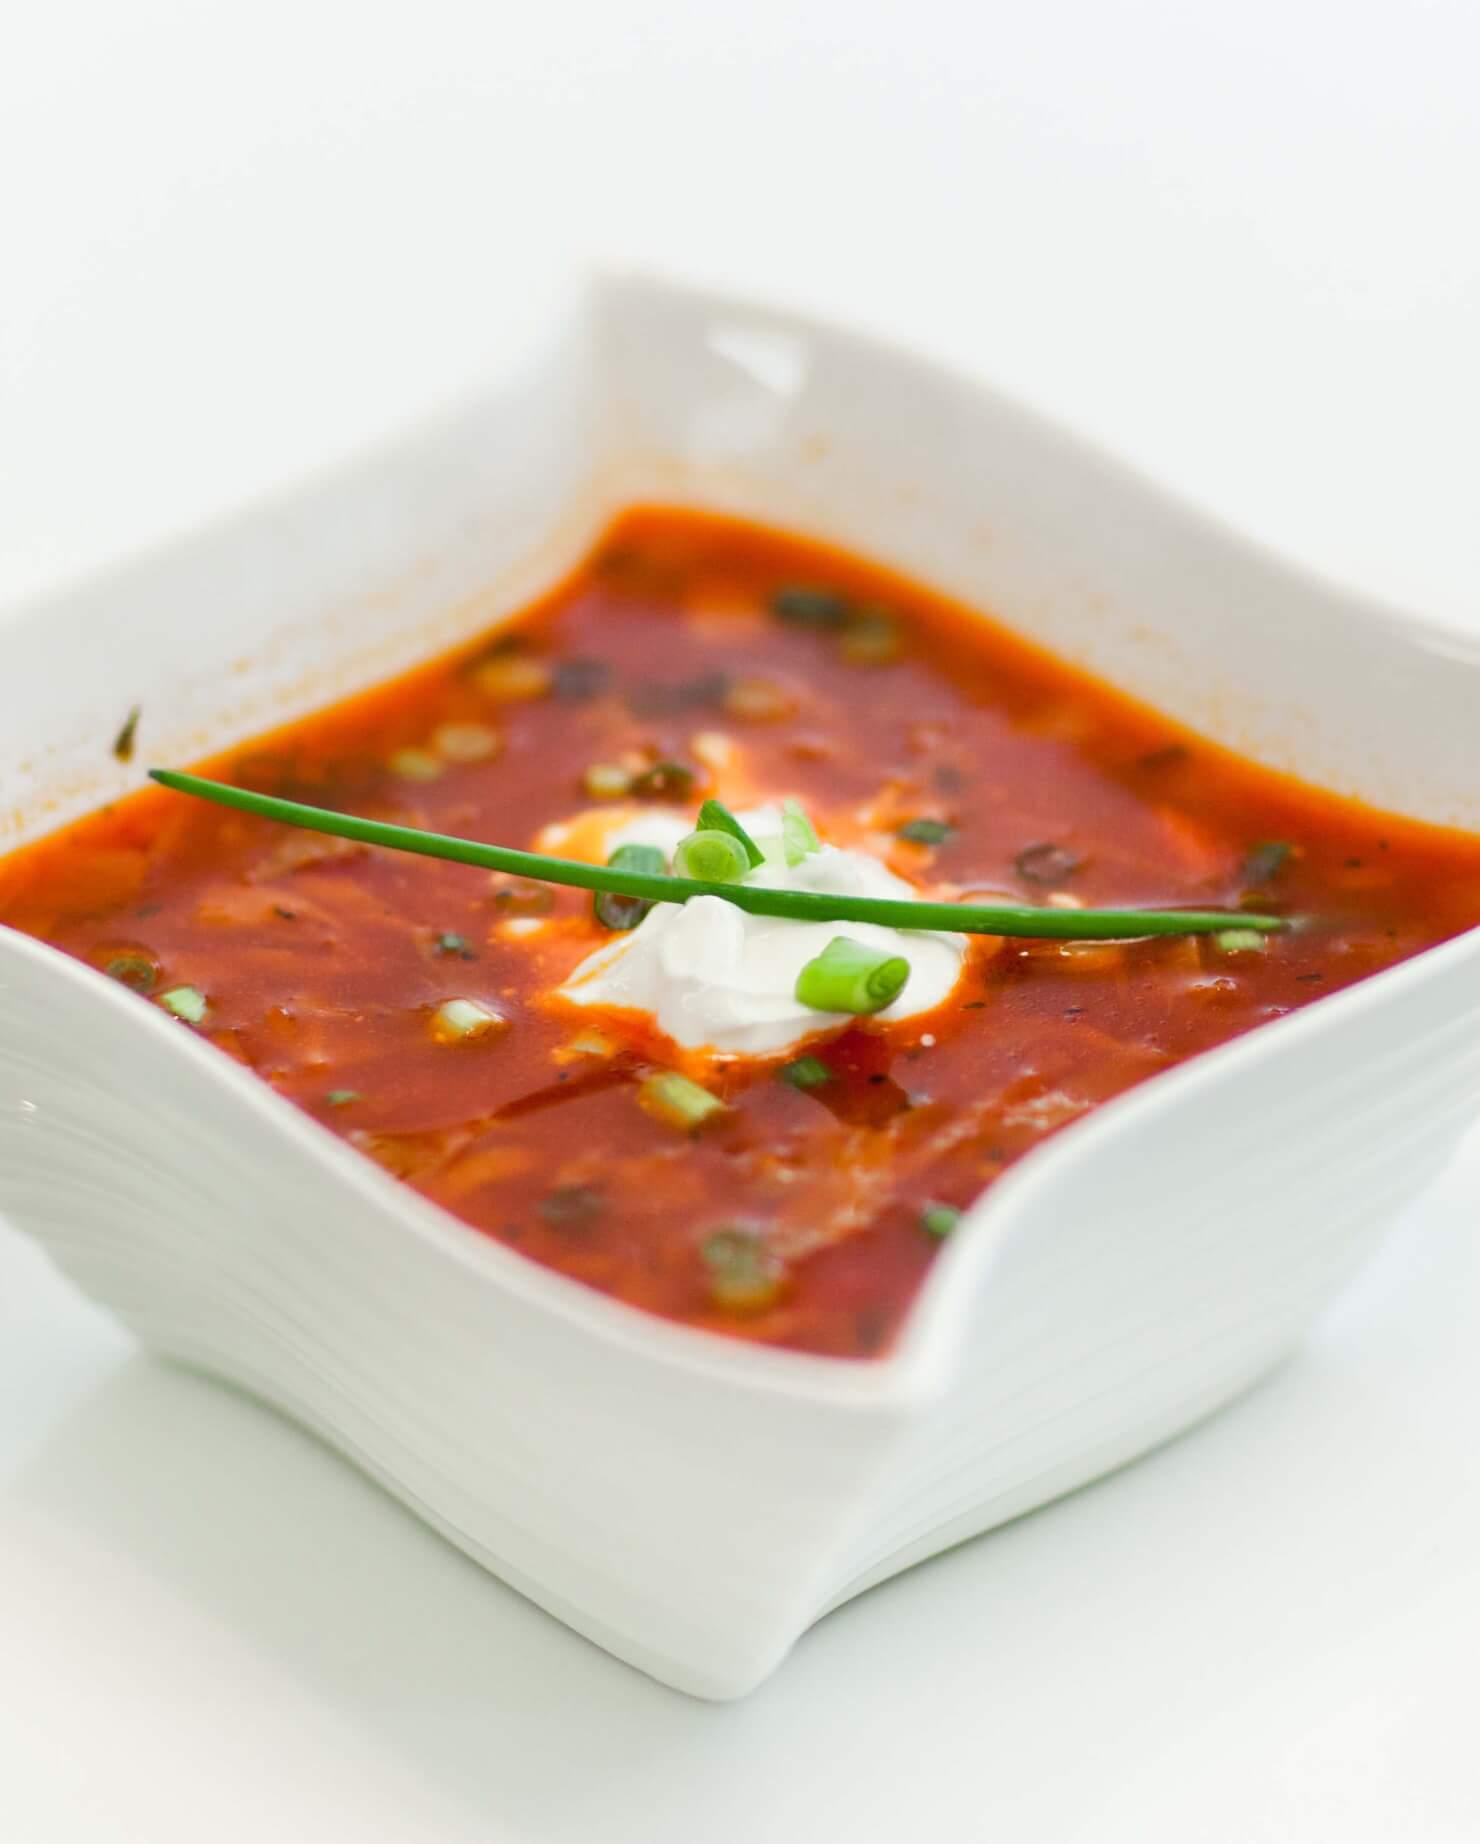 red beet and beef borscht